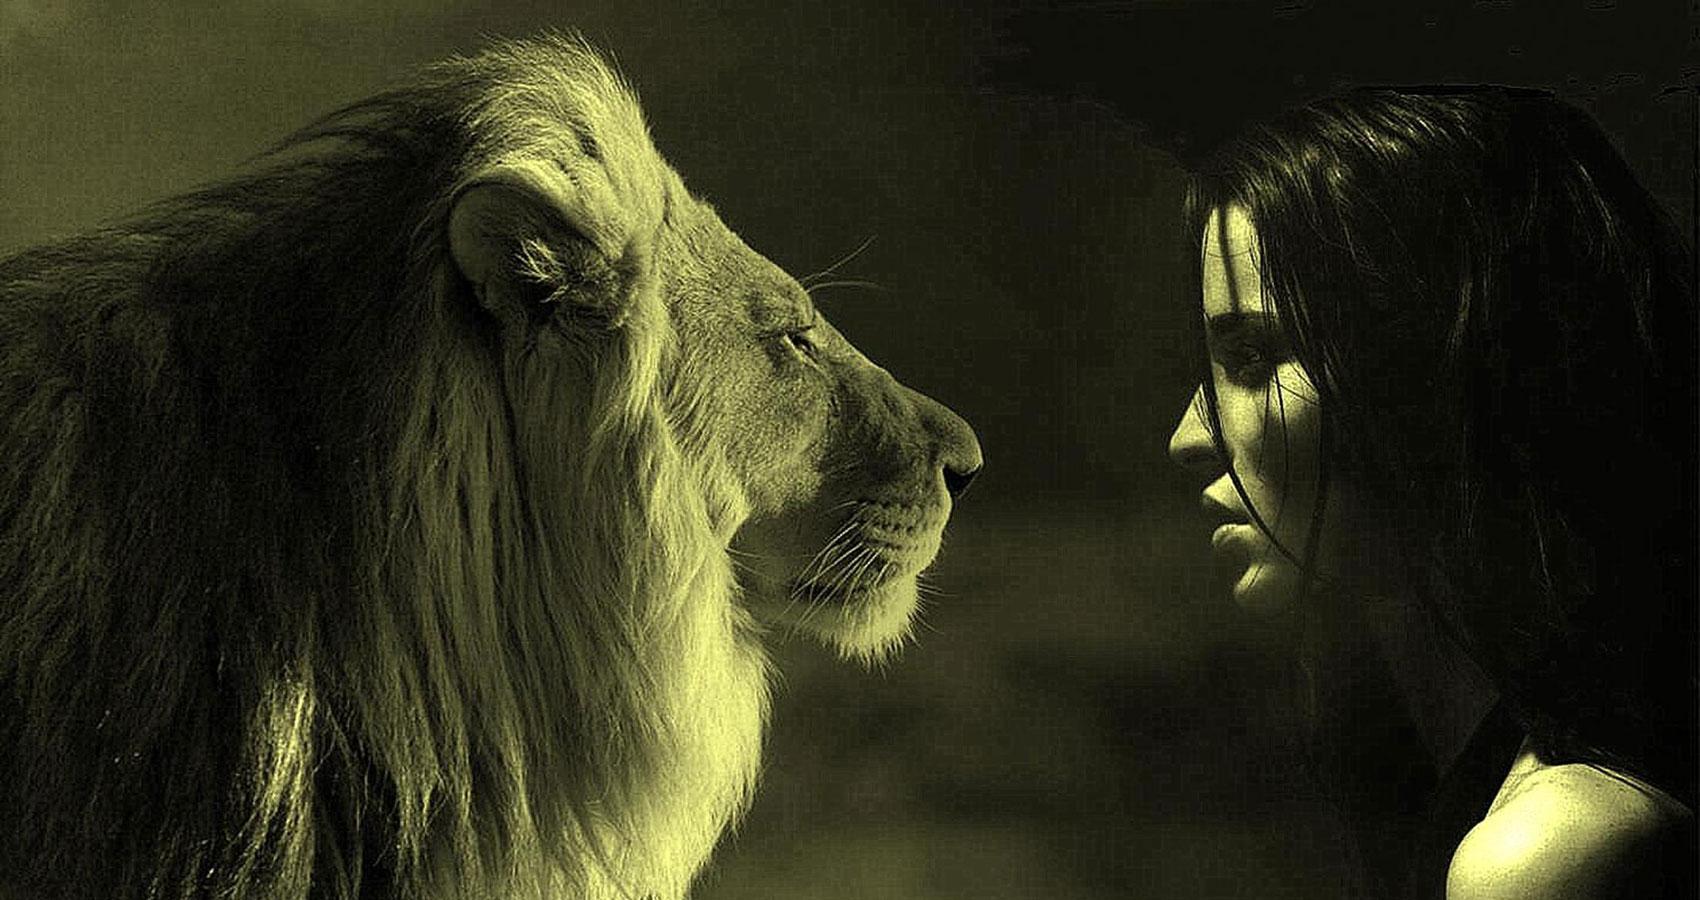 Lioness a poem written by Sarita Montiel at Spillwords.com